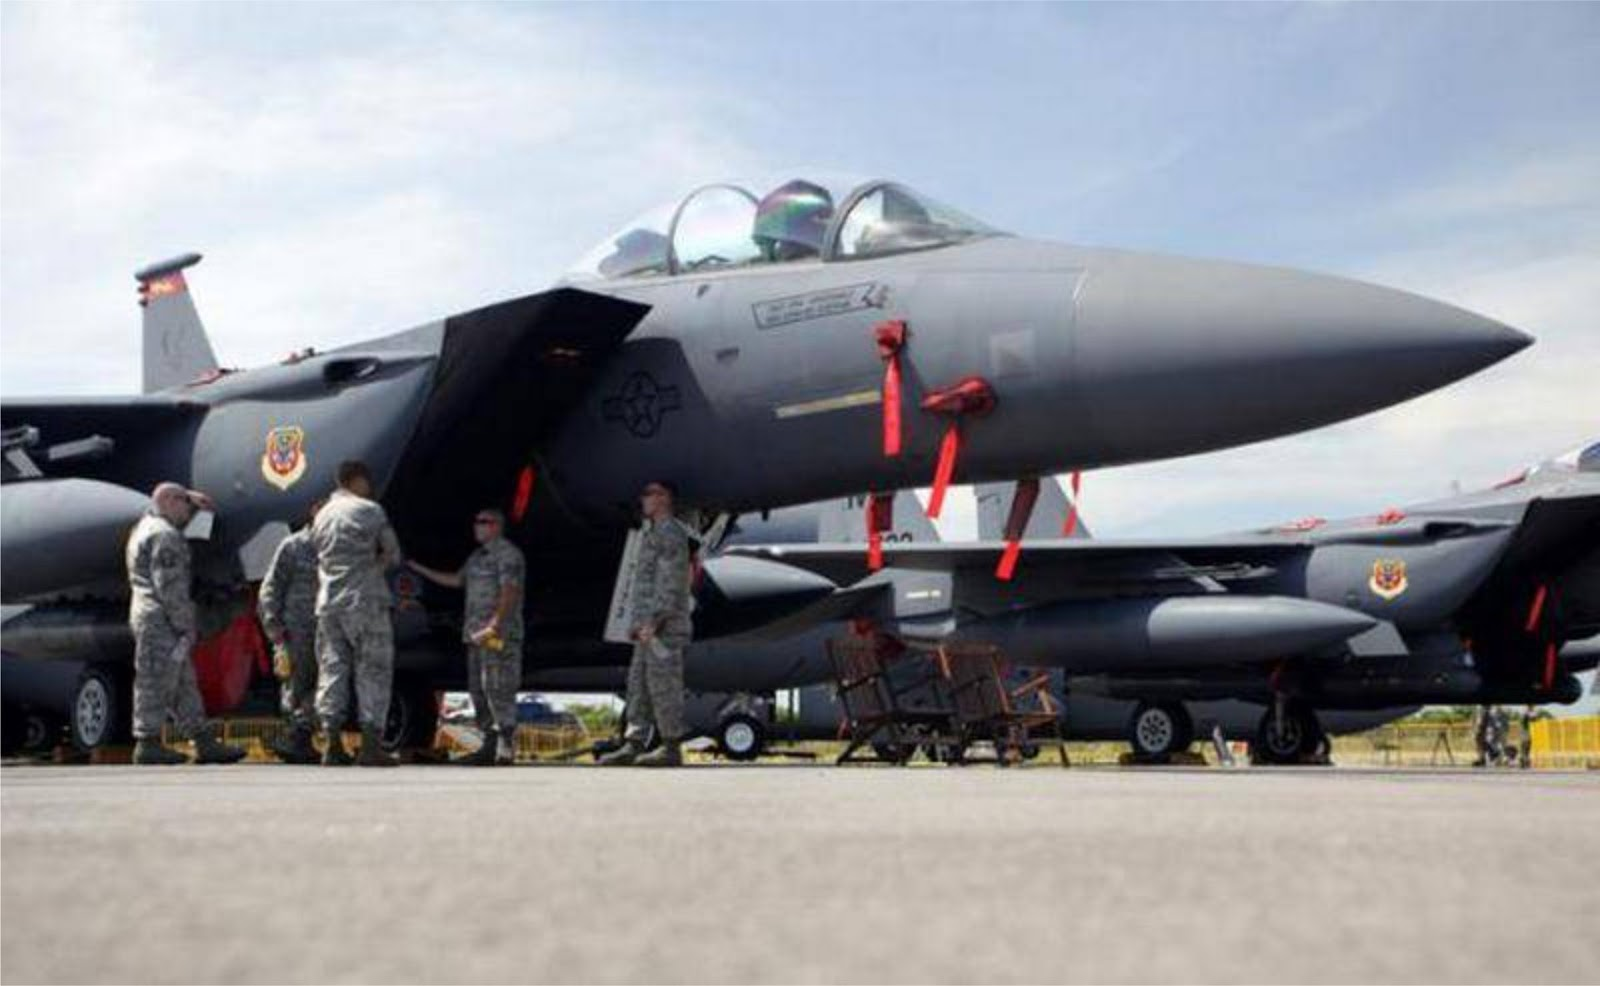 Pesawat F-15 Angkatan Udara AS melakukan pendaratan di Ukraina selama latihan